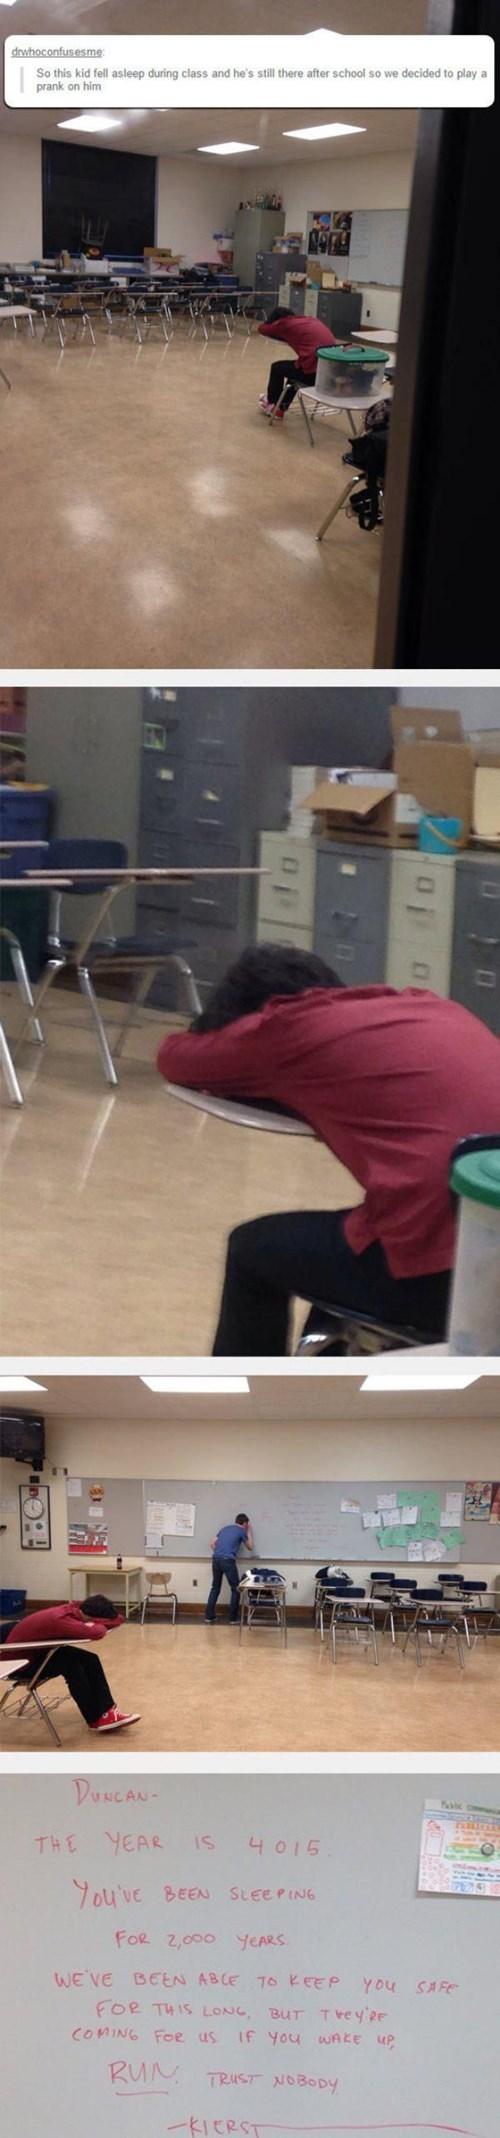 funny-prank-win-pic-class-nap